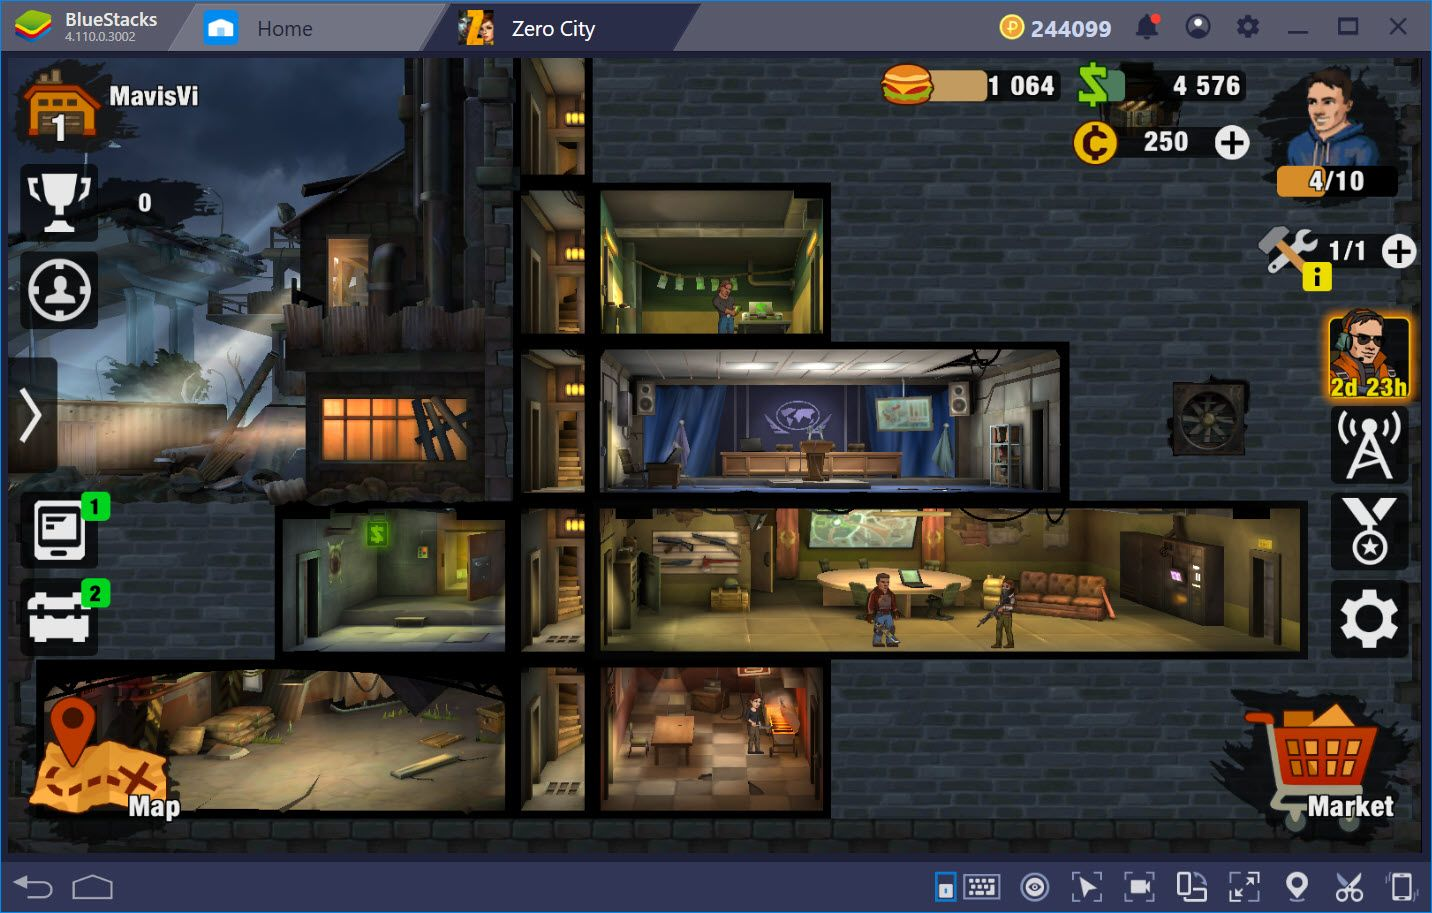 Cách chơi cơ bản để sinh tồn trong Zero City: Zombie Shelter Survival